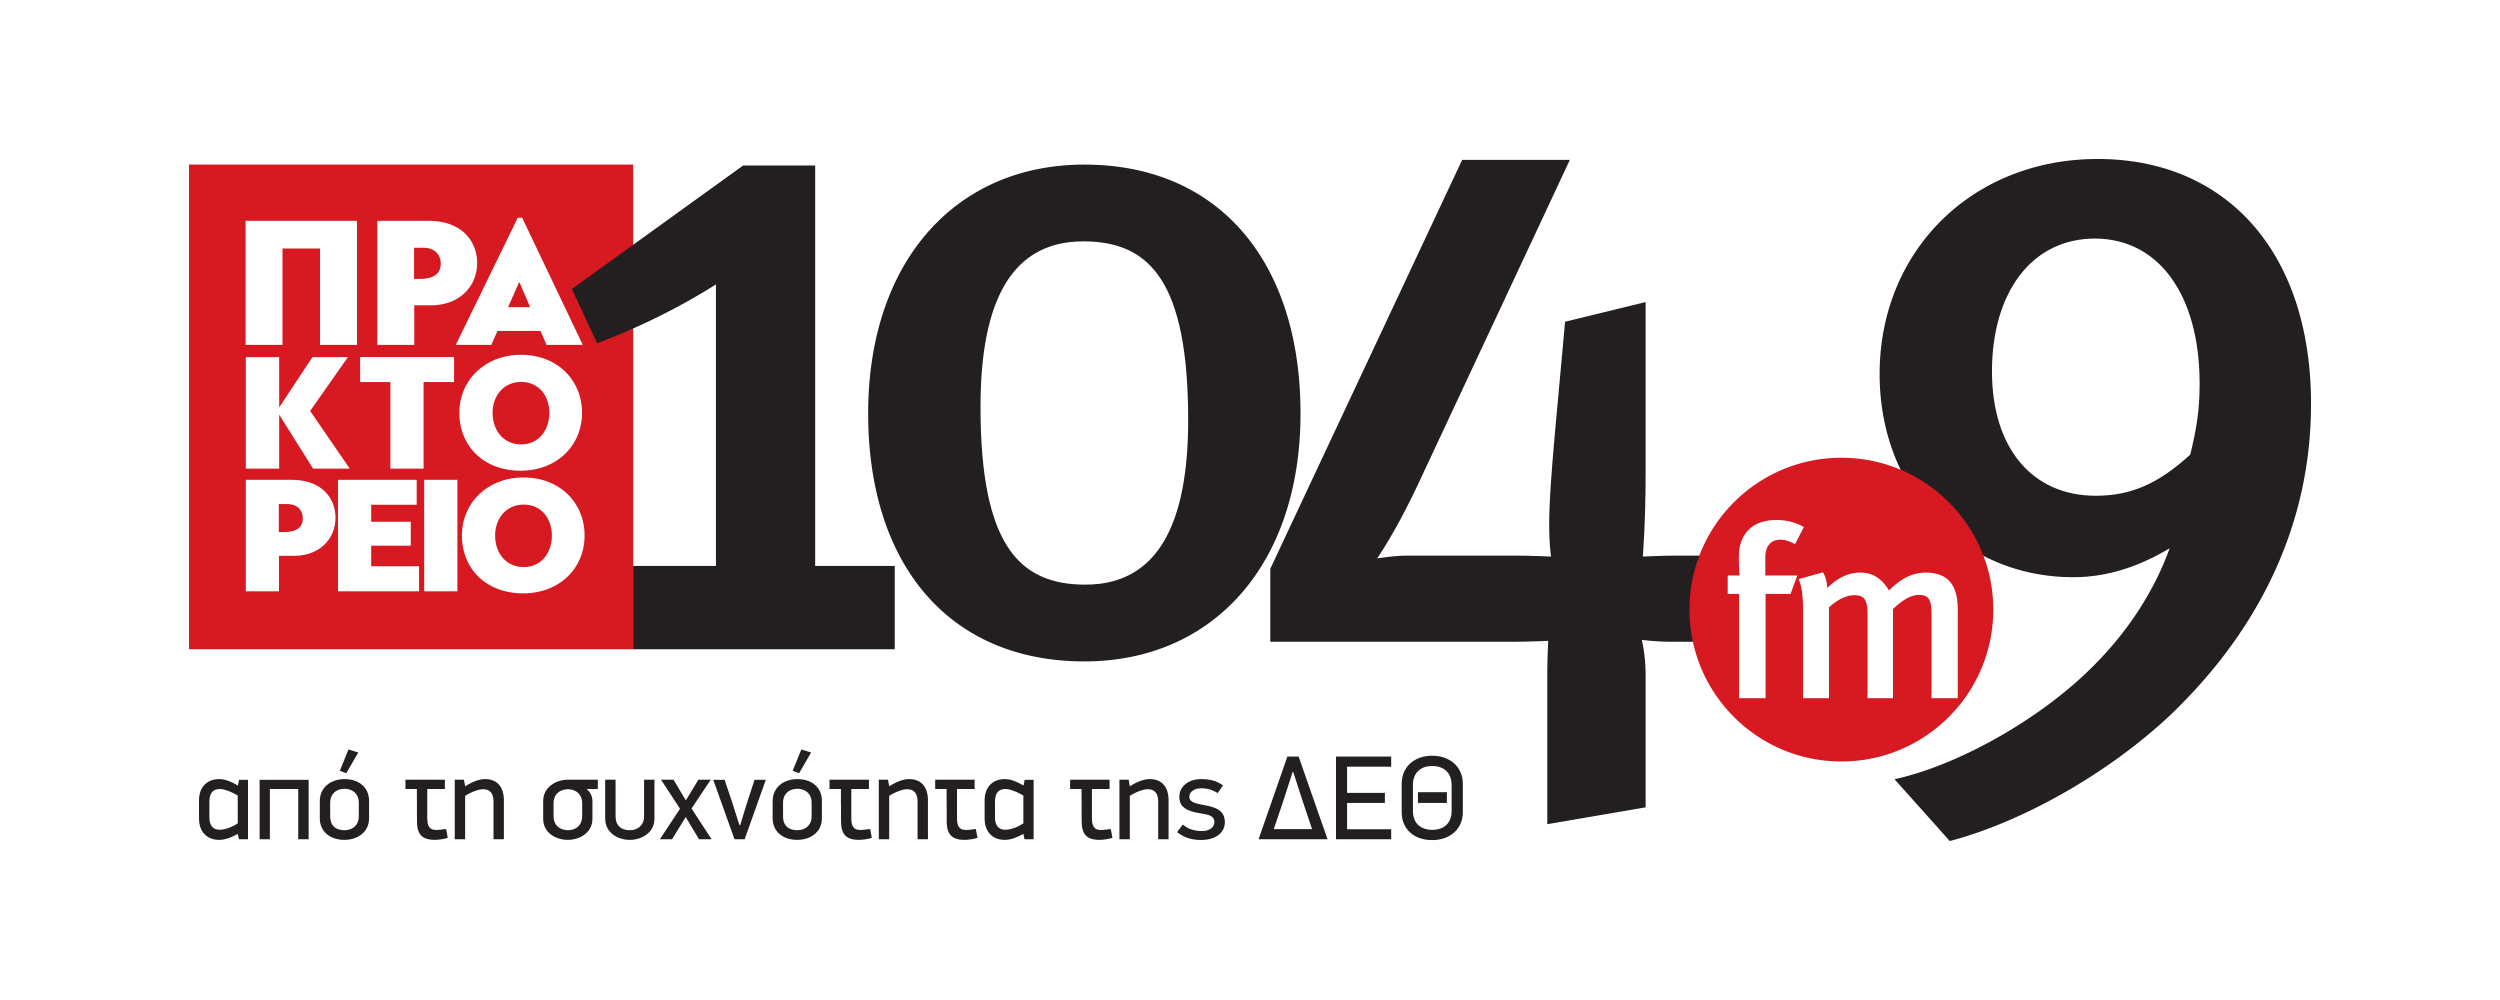 LOGO_PRAKTOREIO_FM_104.9_new_C1.jpg